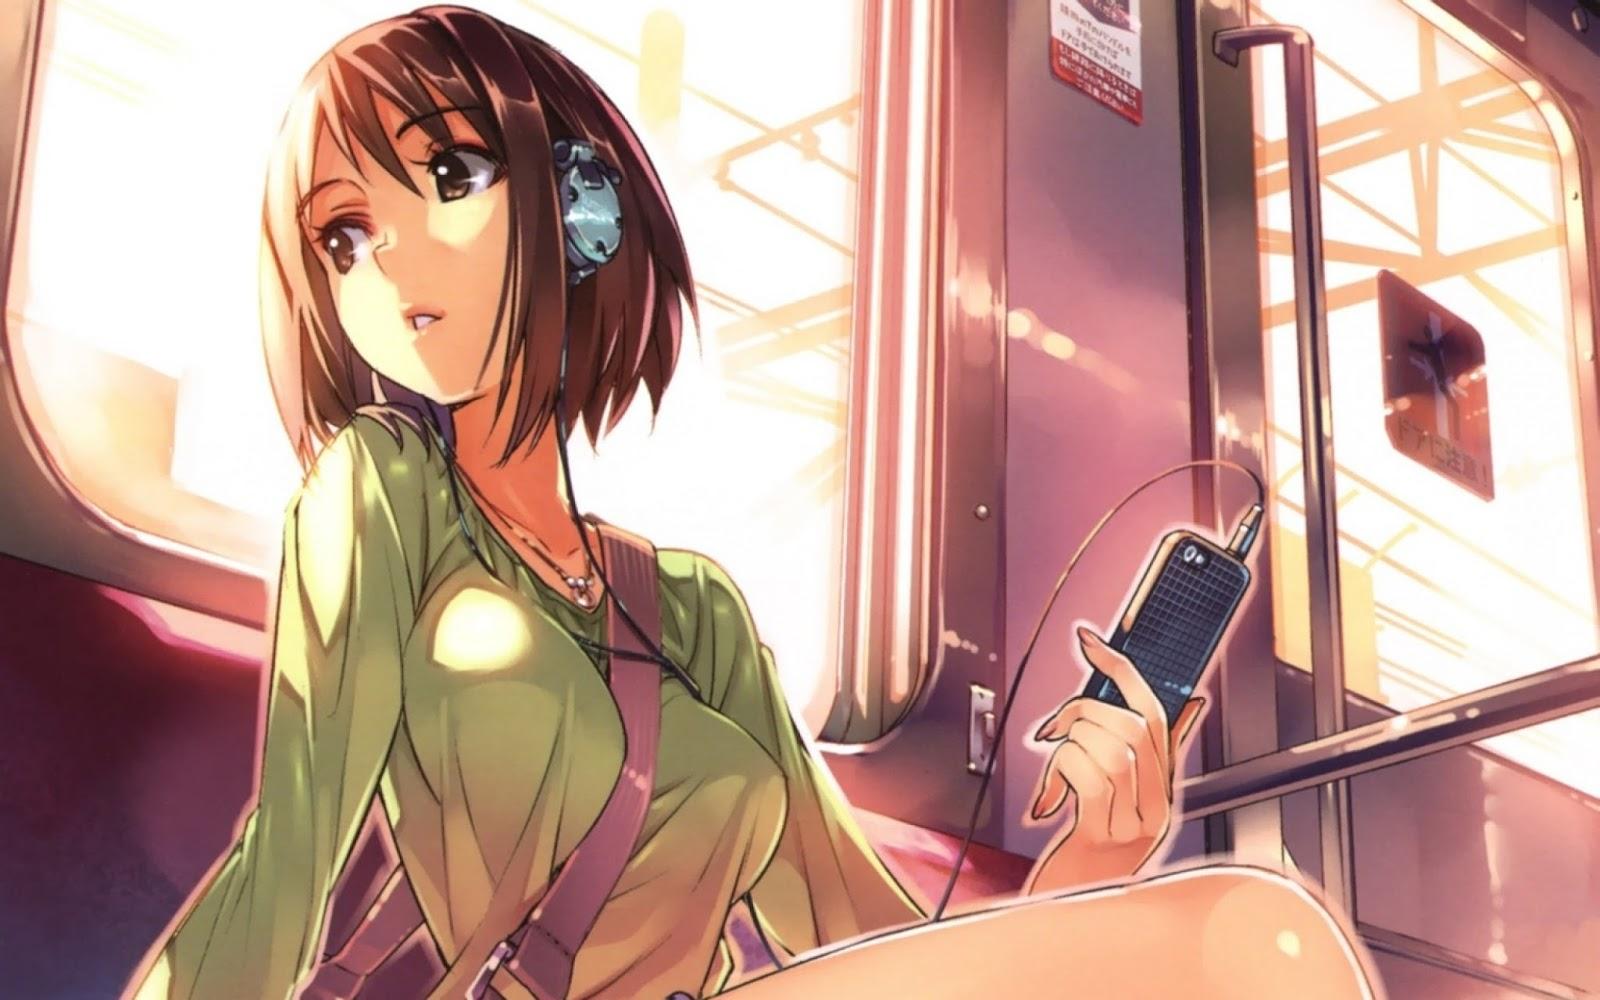 Tomboy Anime Girl With Headphones Vi mi tc ngn kiu tomboy 1600x1000